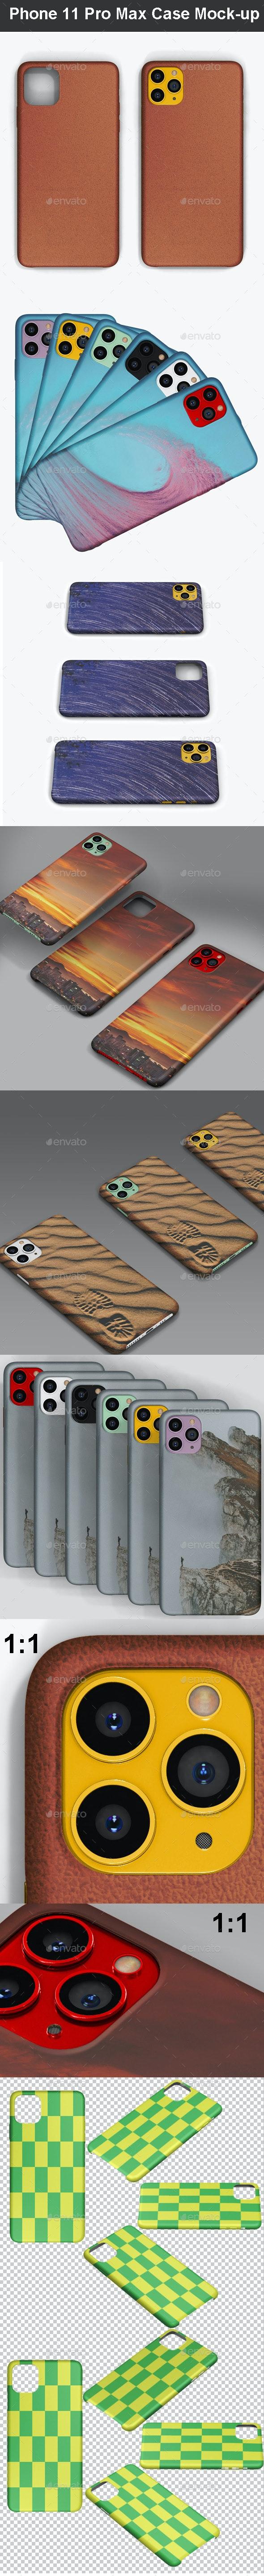 Phone 11 Pro Max Case Mock-up - Mobile Displays